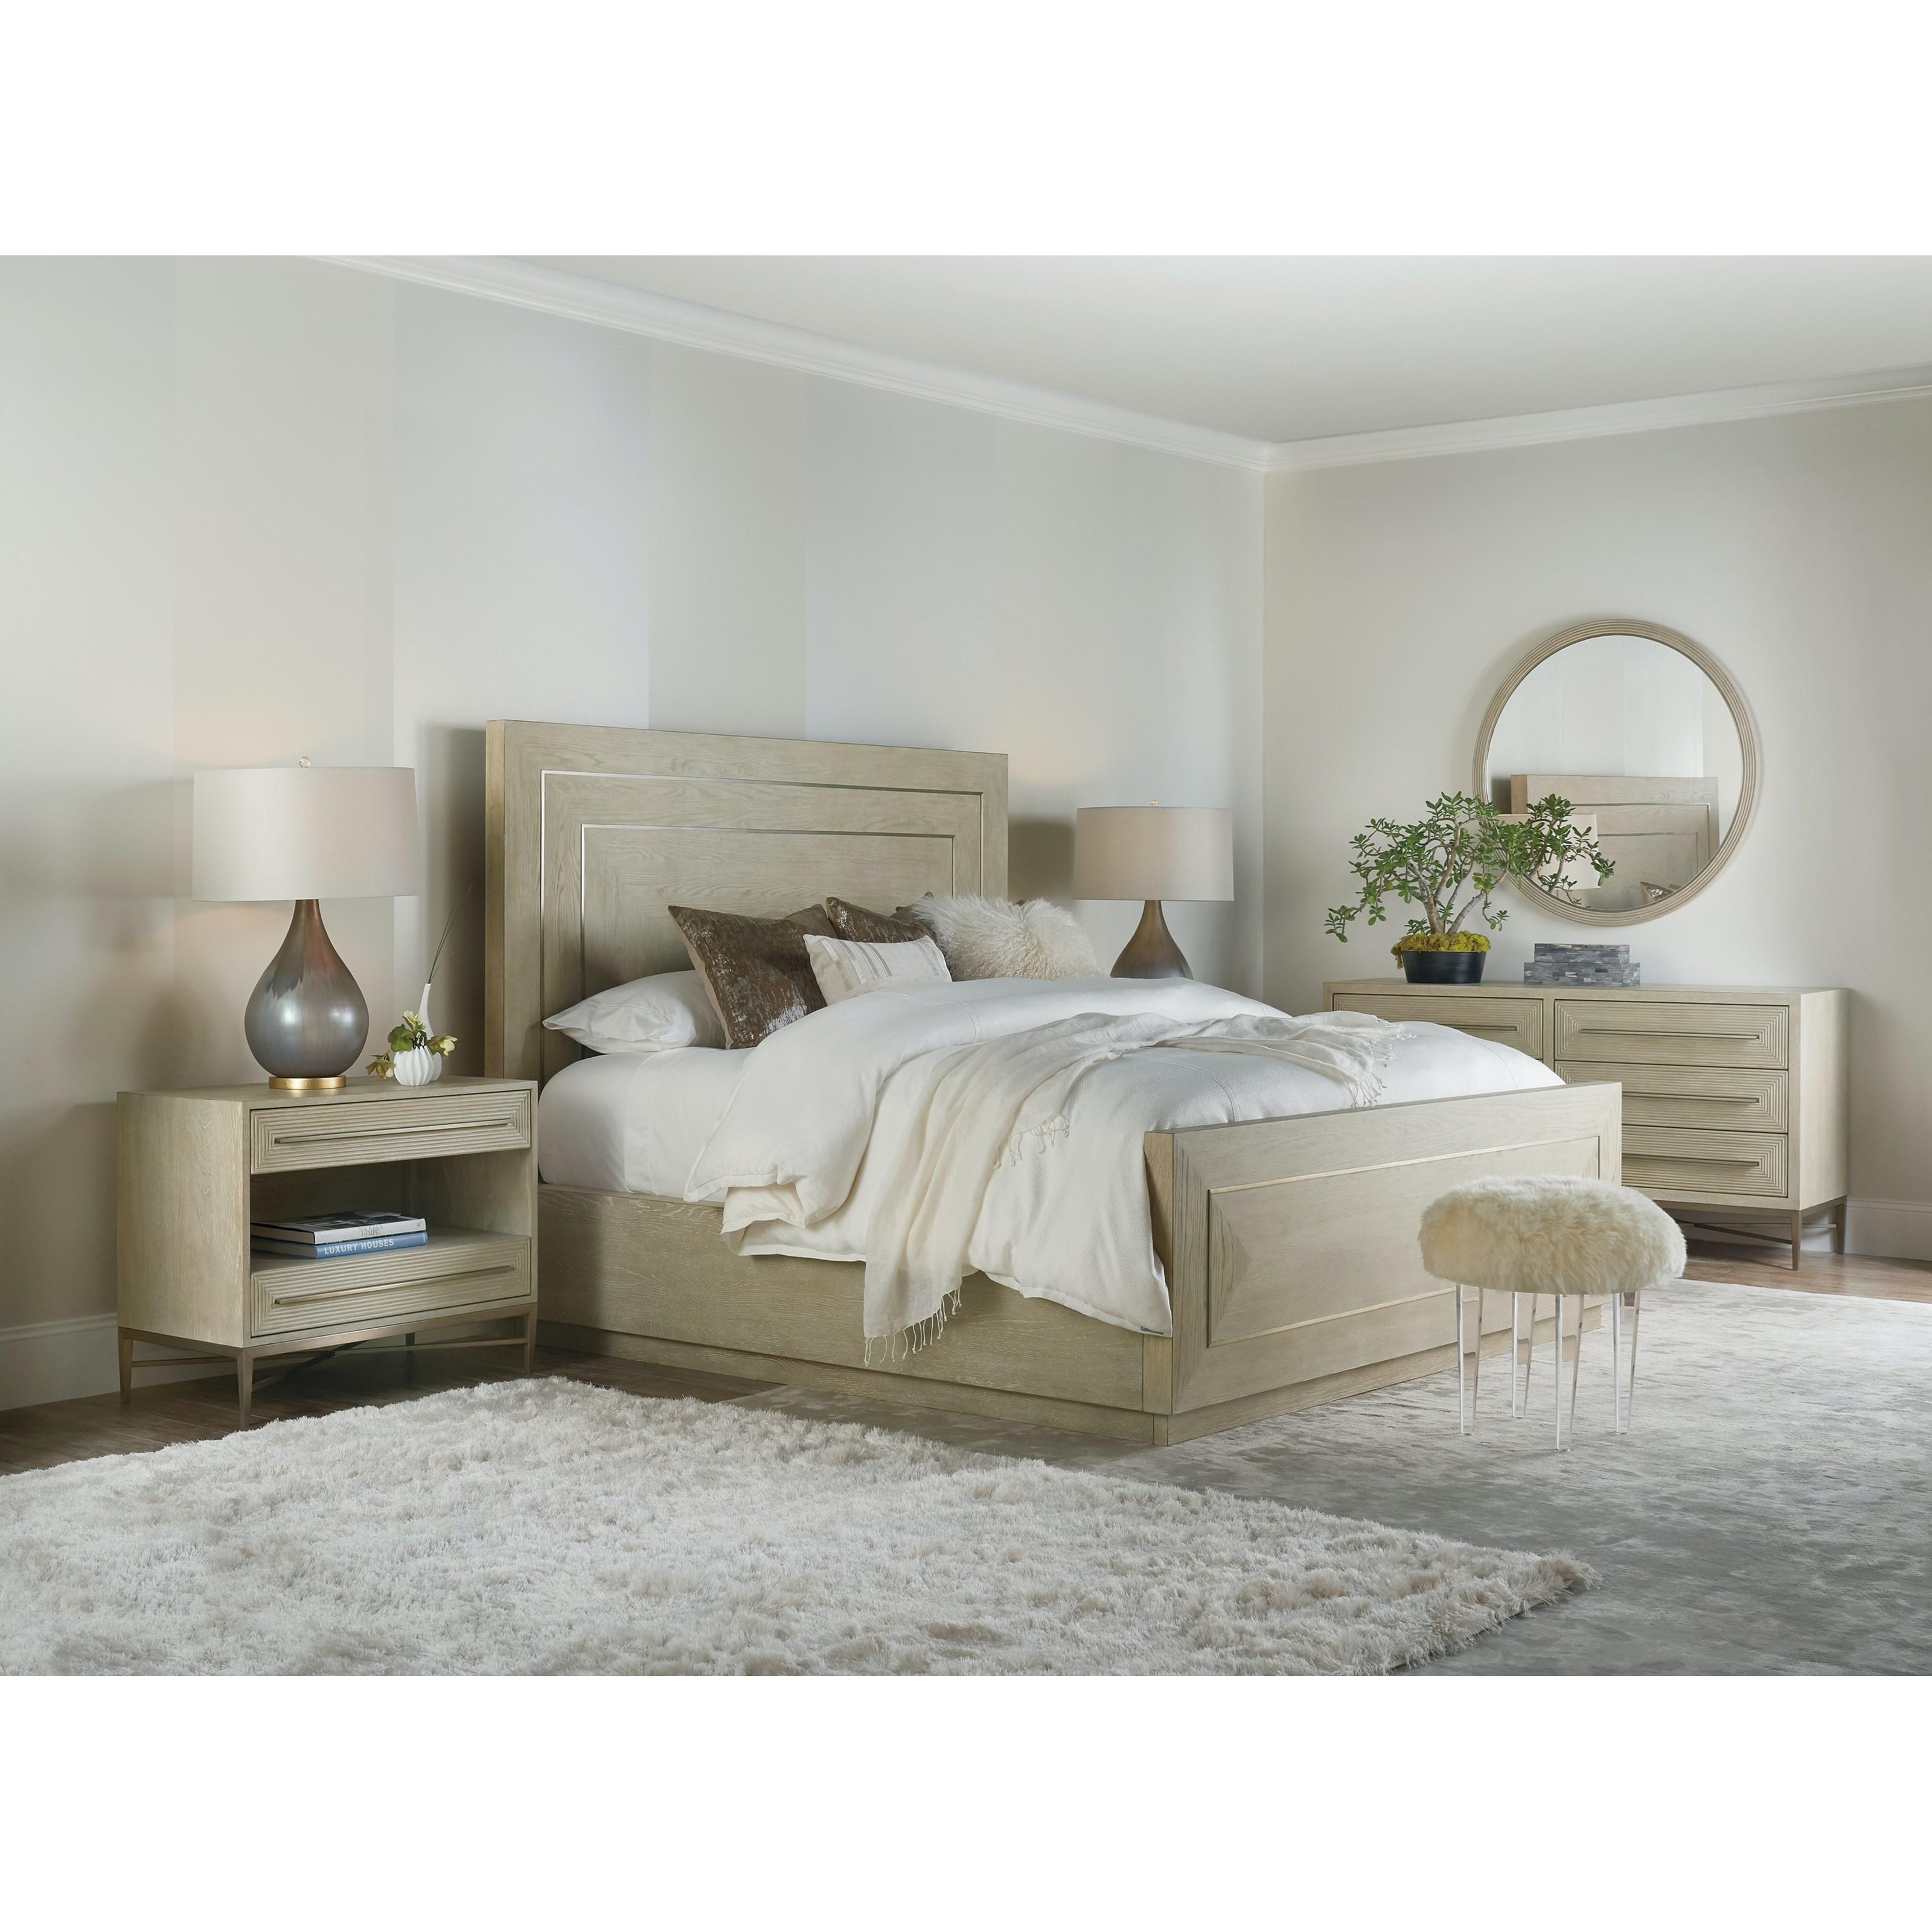 Cascade King Bedroom Group by Hooker Furniture at Baer's Furniture